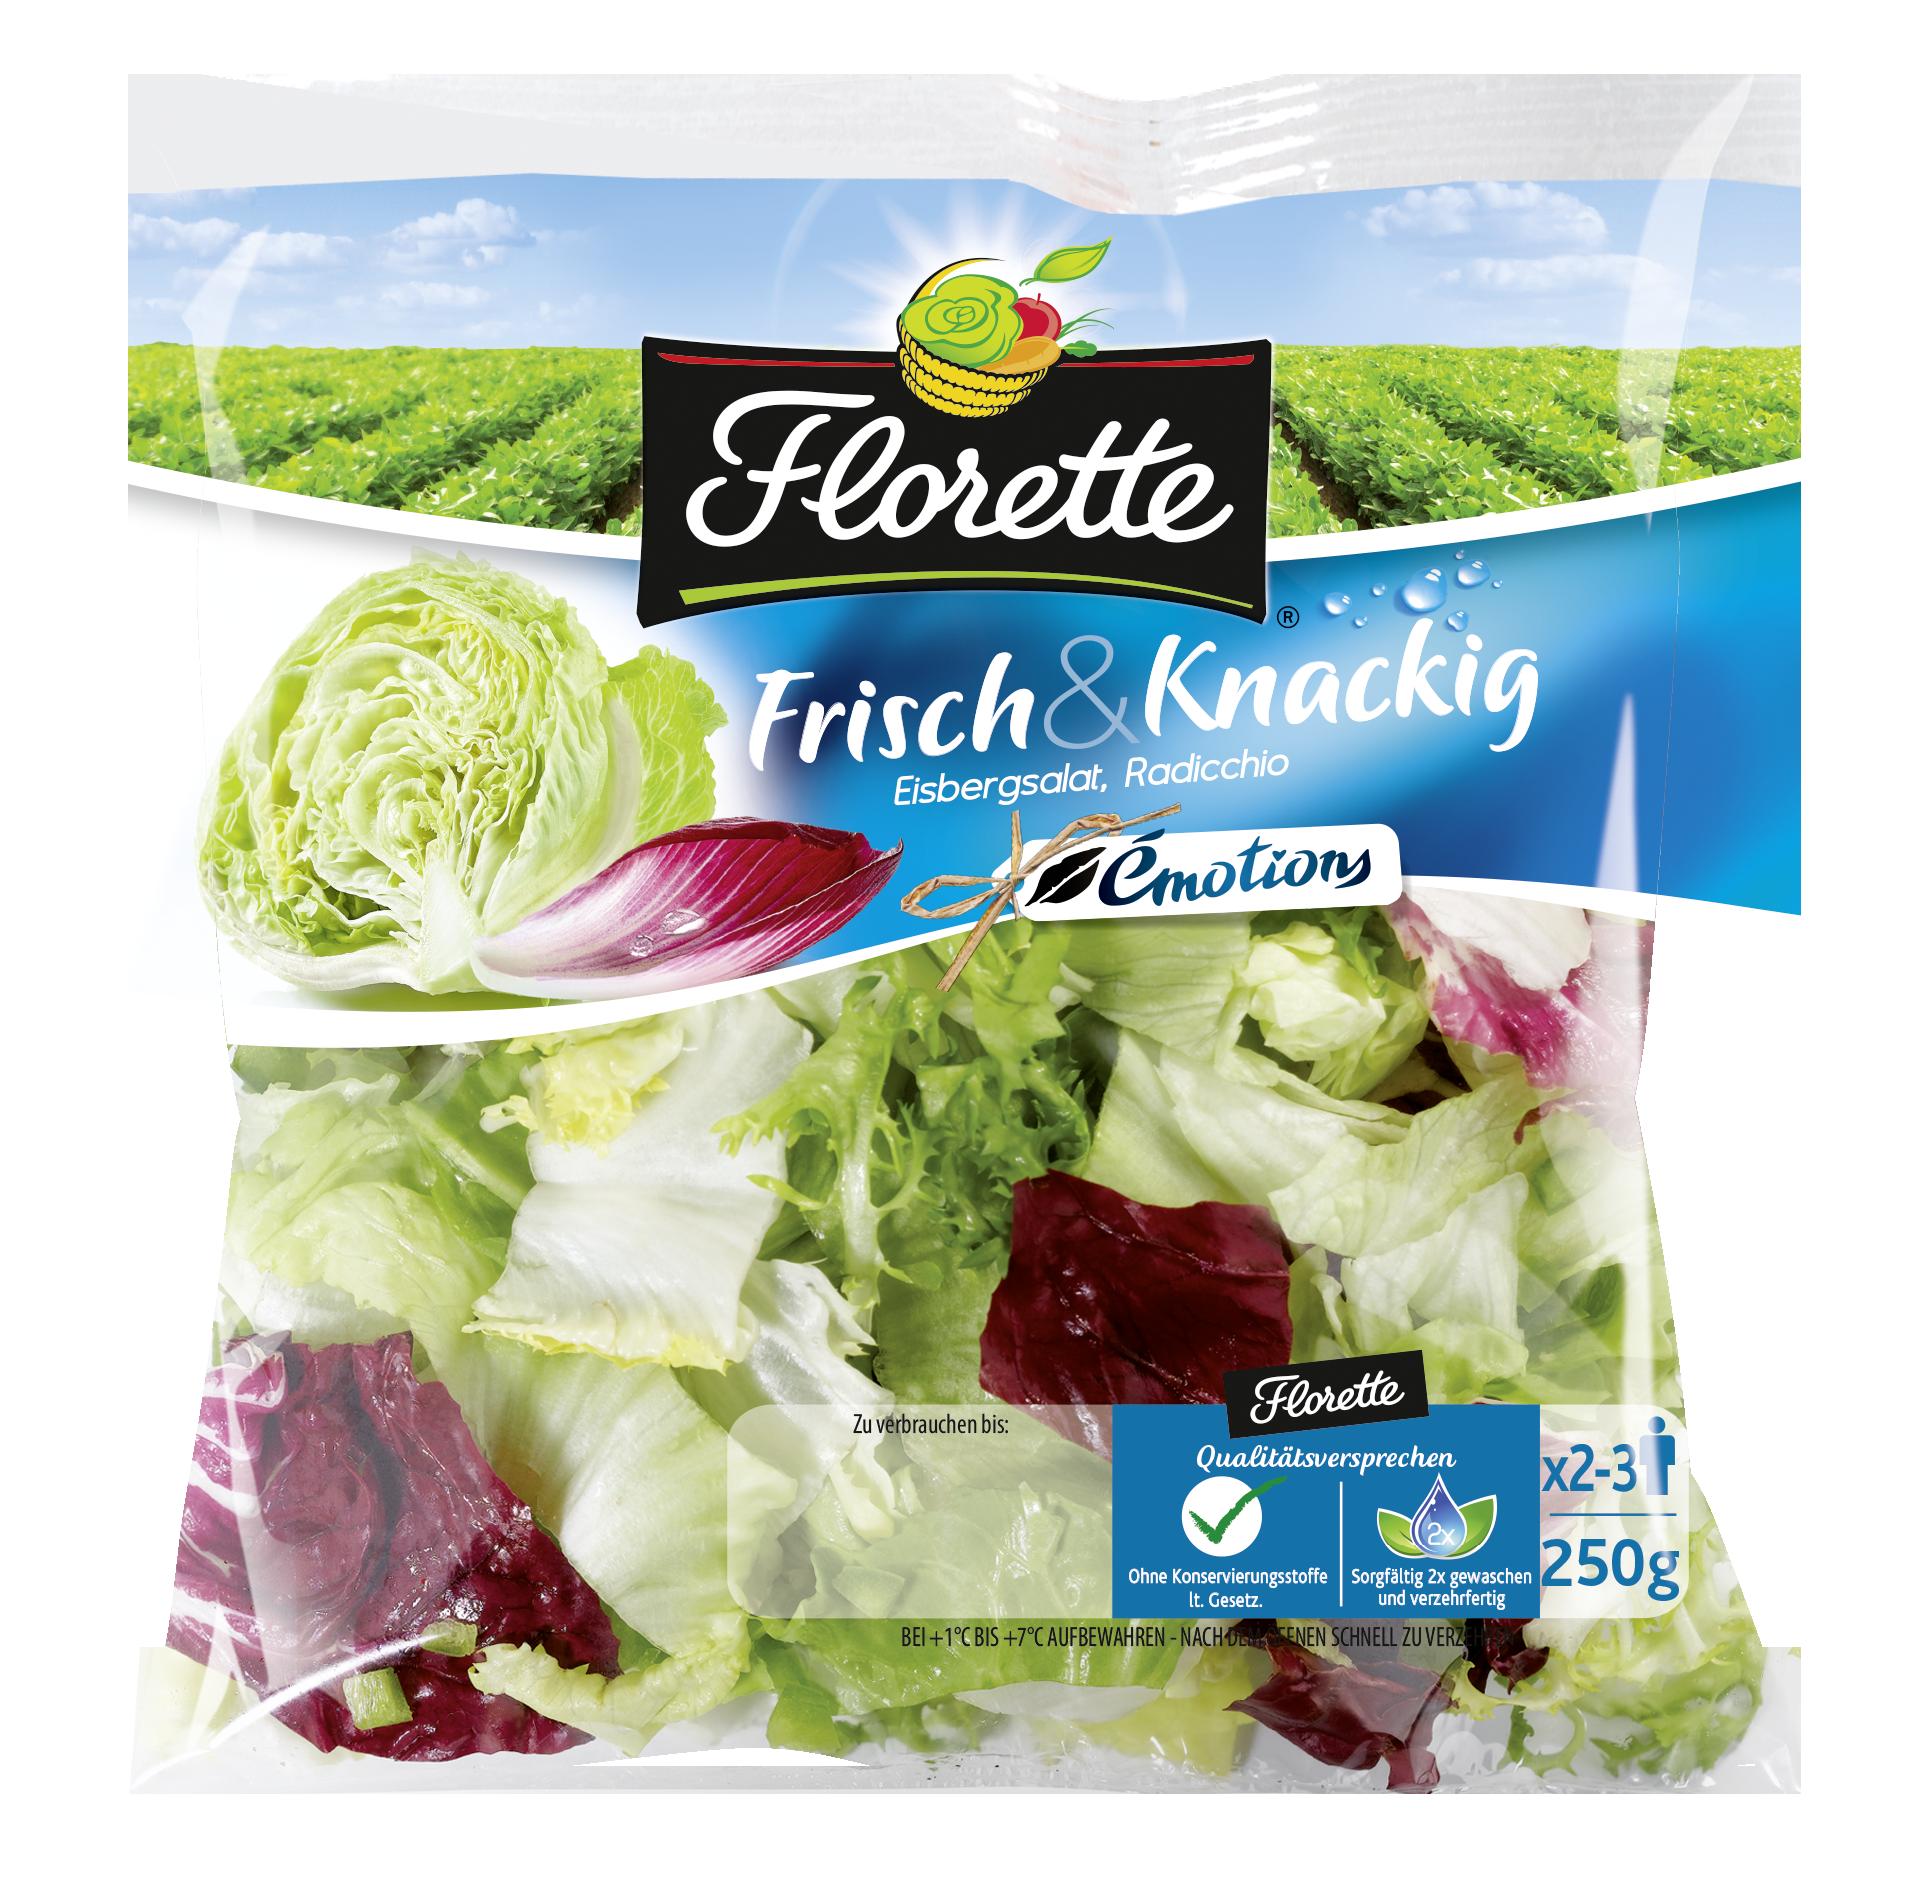 Florette Frisch&Knackig